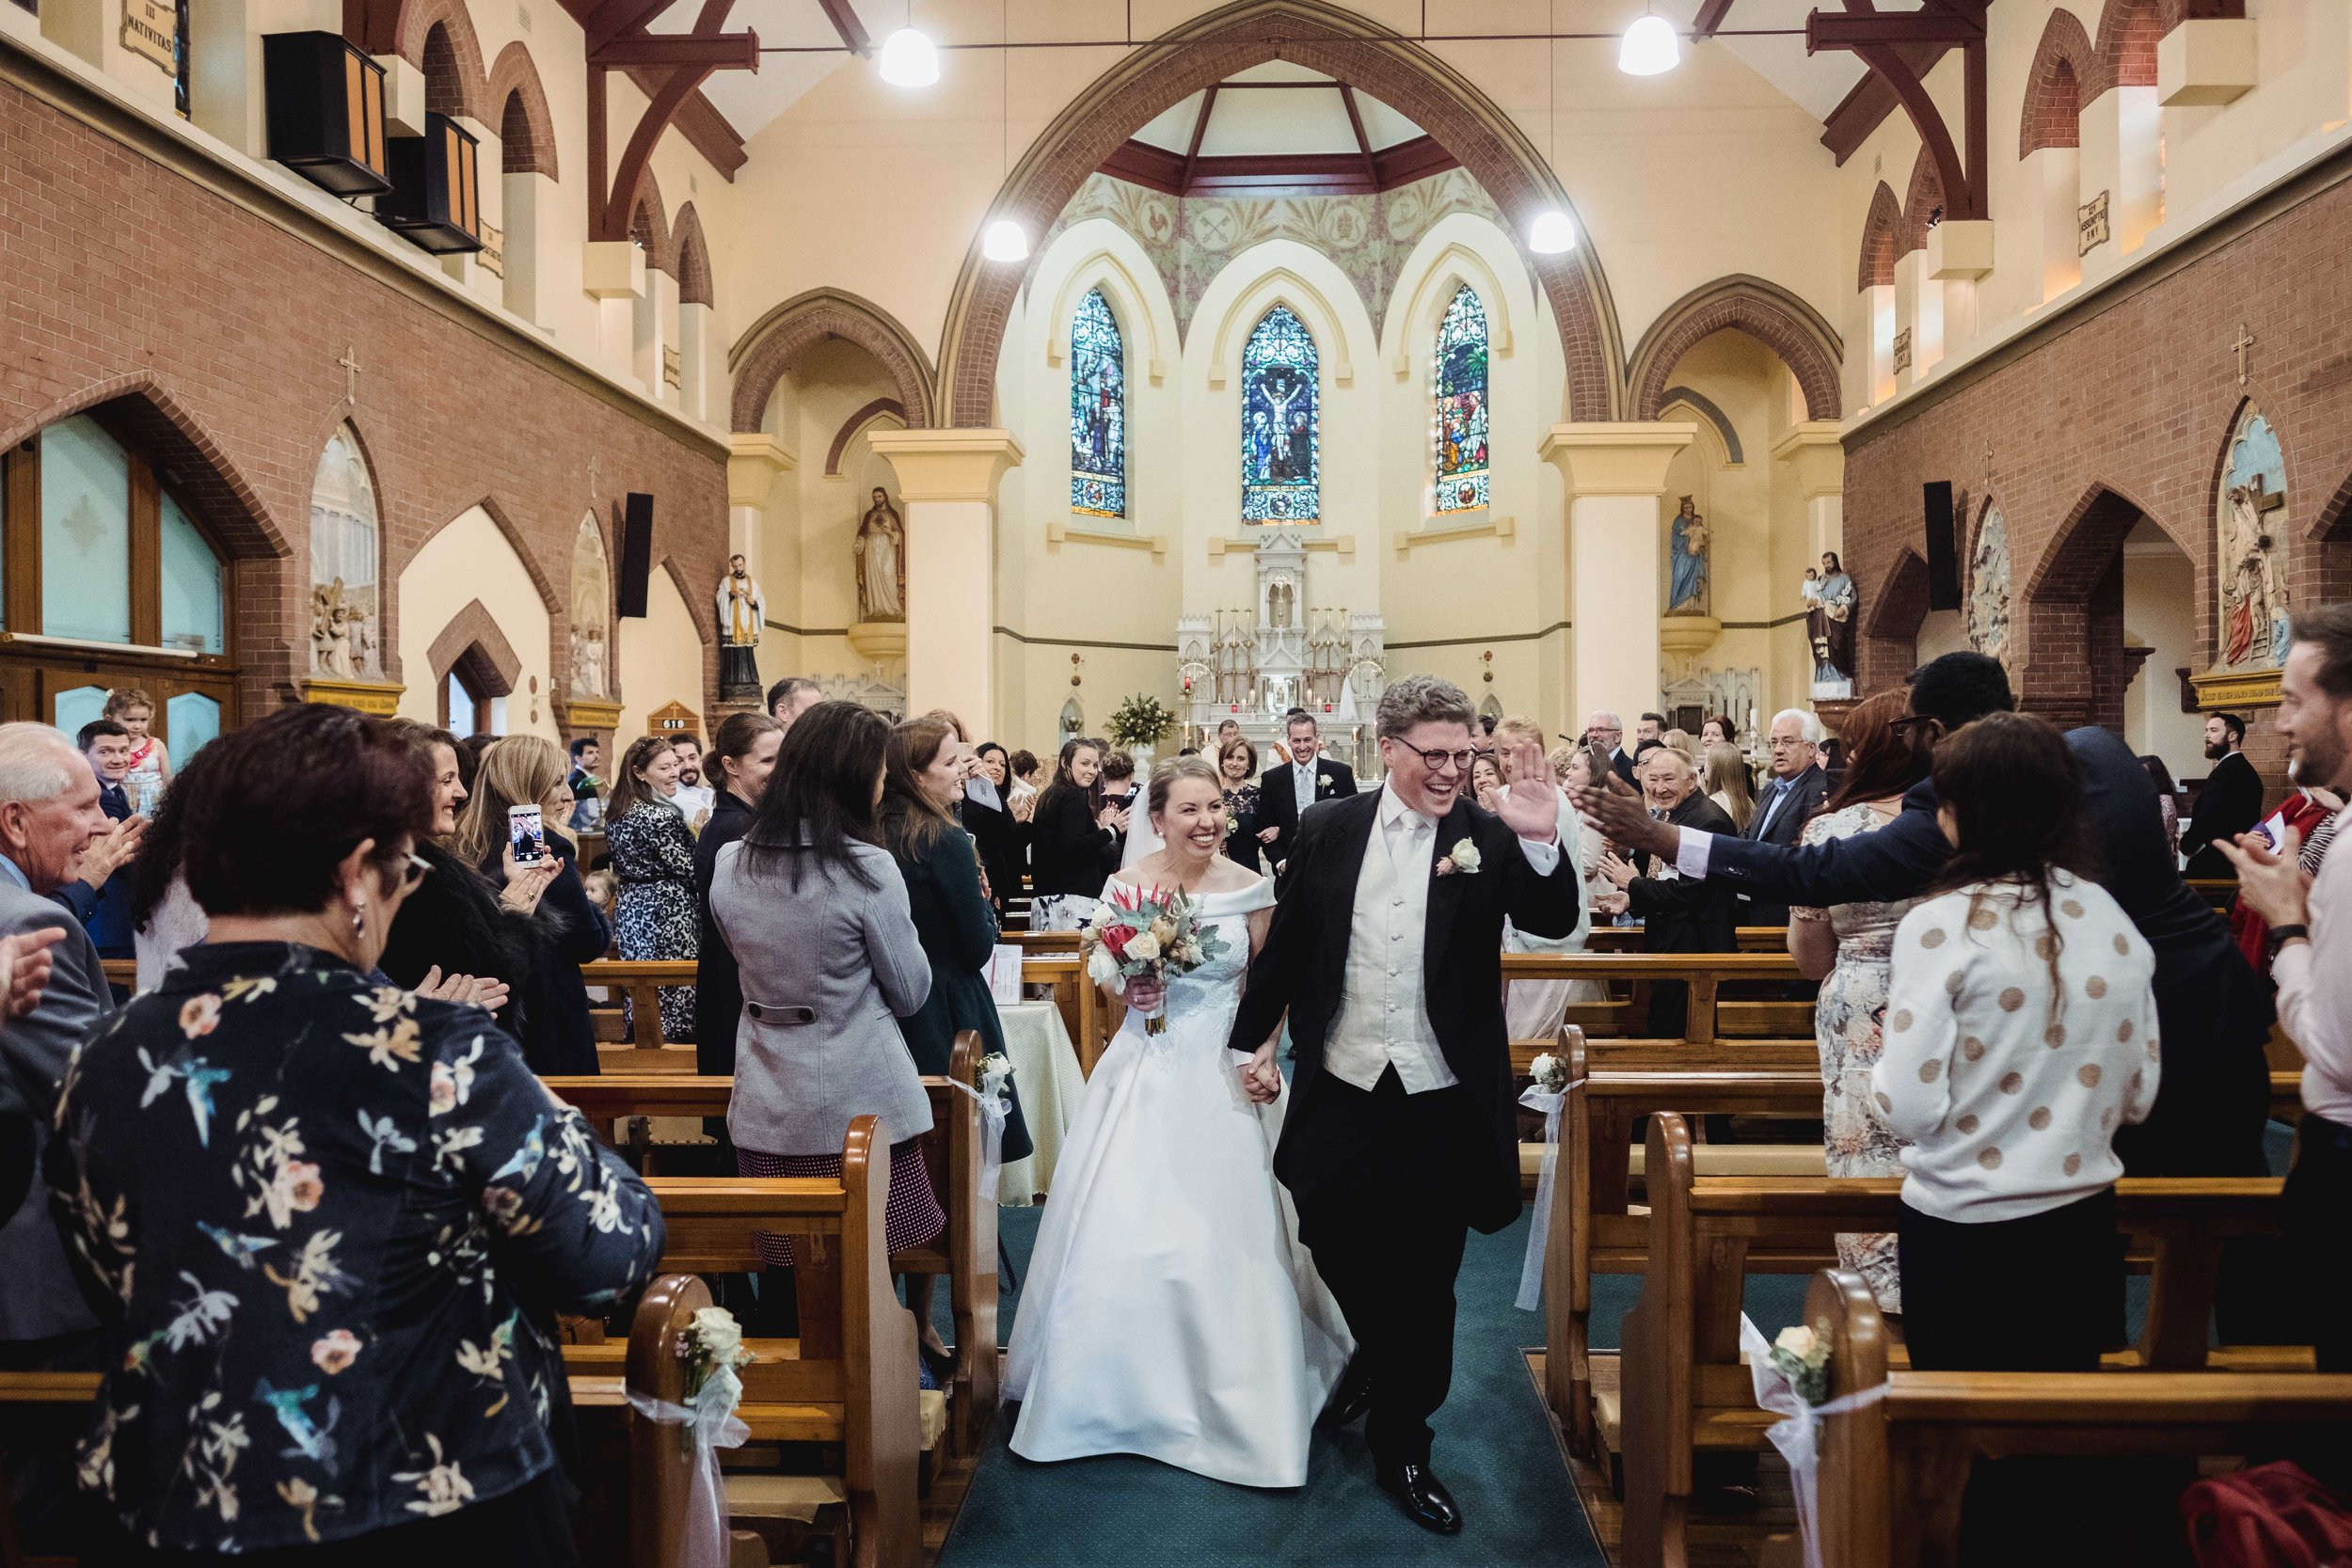 Bernie and Hally Gledswood Homestead Wedding by Milton Gan Photography 06.jpg